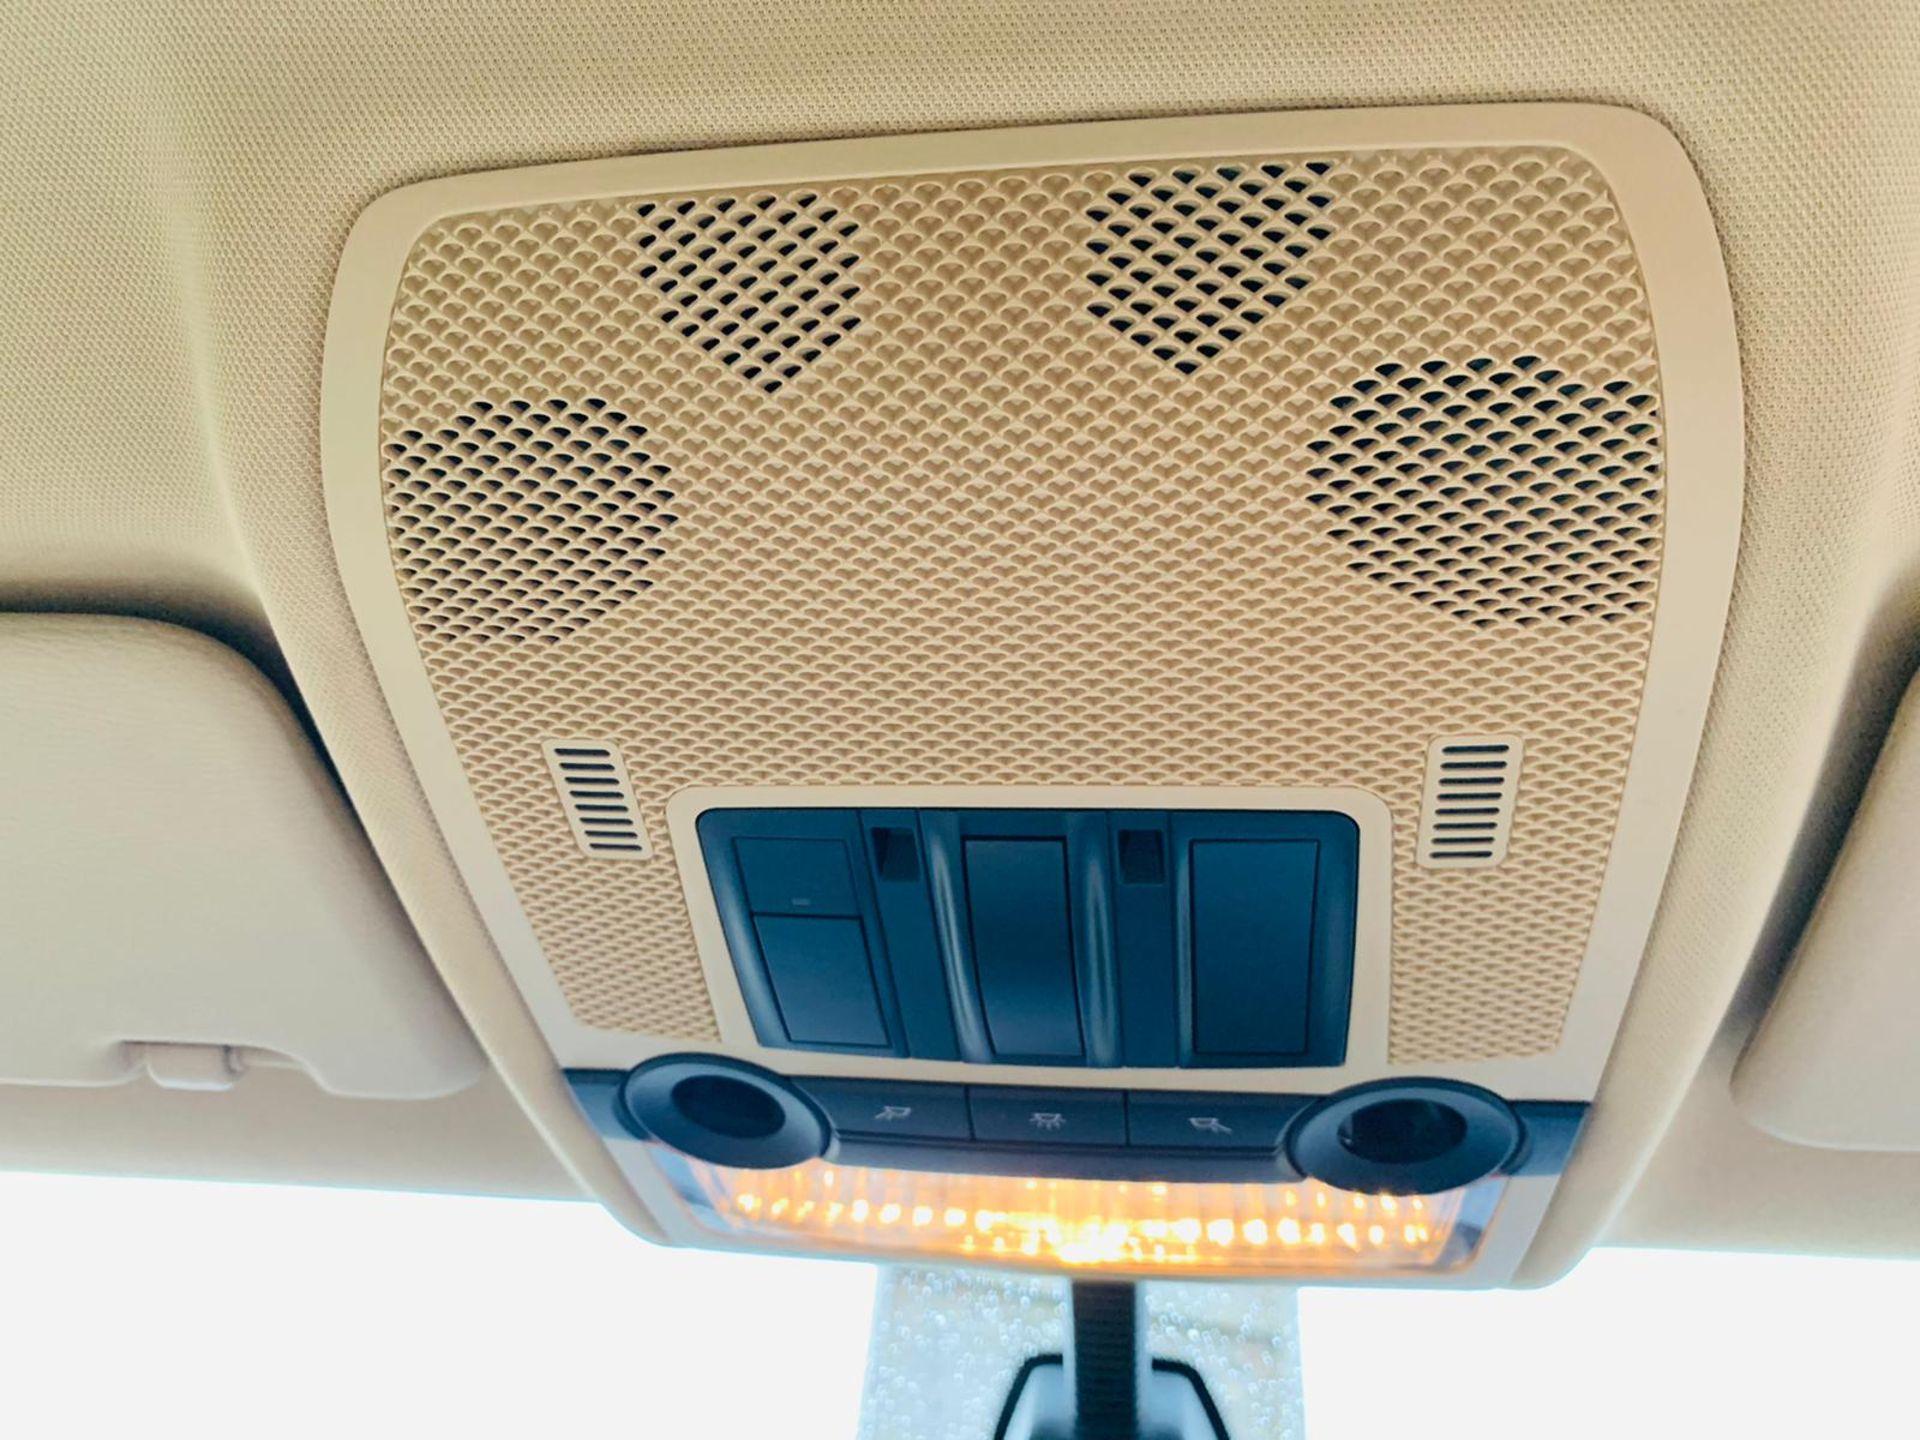 Reseve Met - BMW X6 xDrive 3.0d Auto - 2014 Reg - Leather Interior -Parking Sensors - Reversing Cam - Image 20 of 30